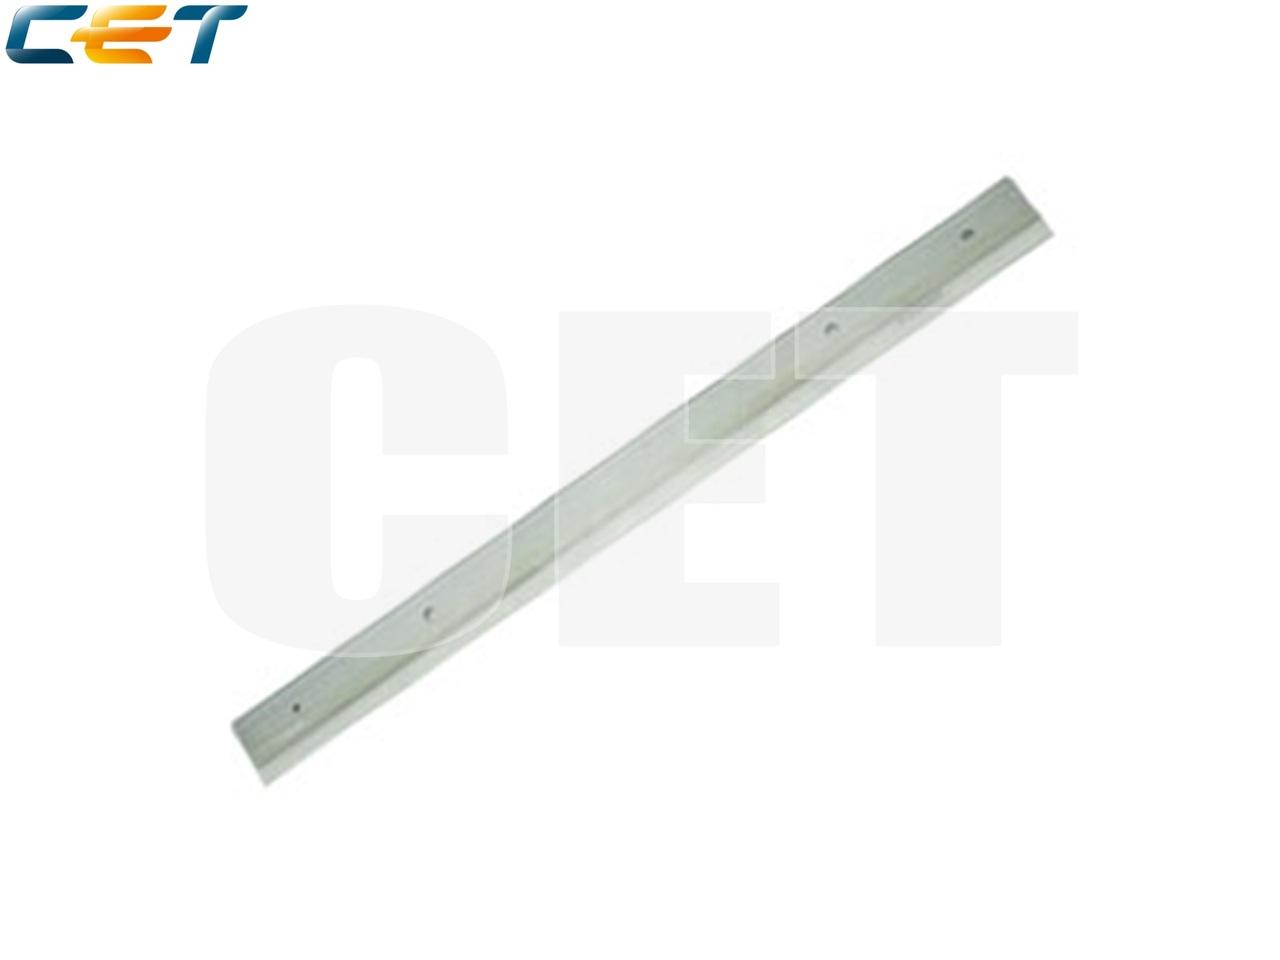 Ракель 6LA27554000 для TOSHIBA E-Studio 350/450 (CET),CET4670